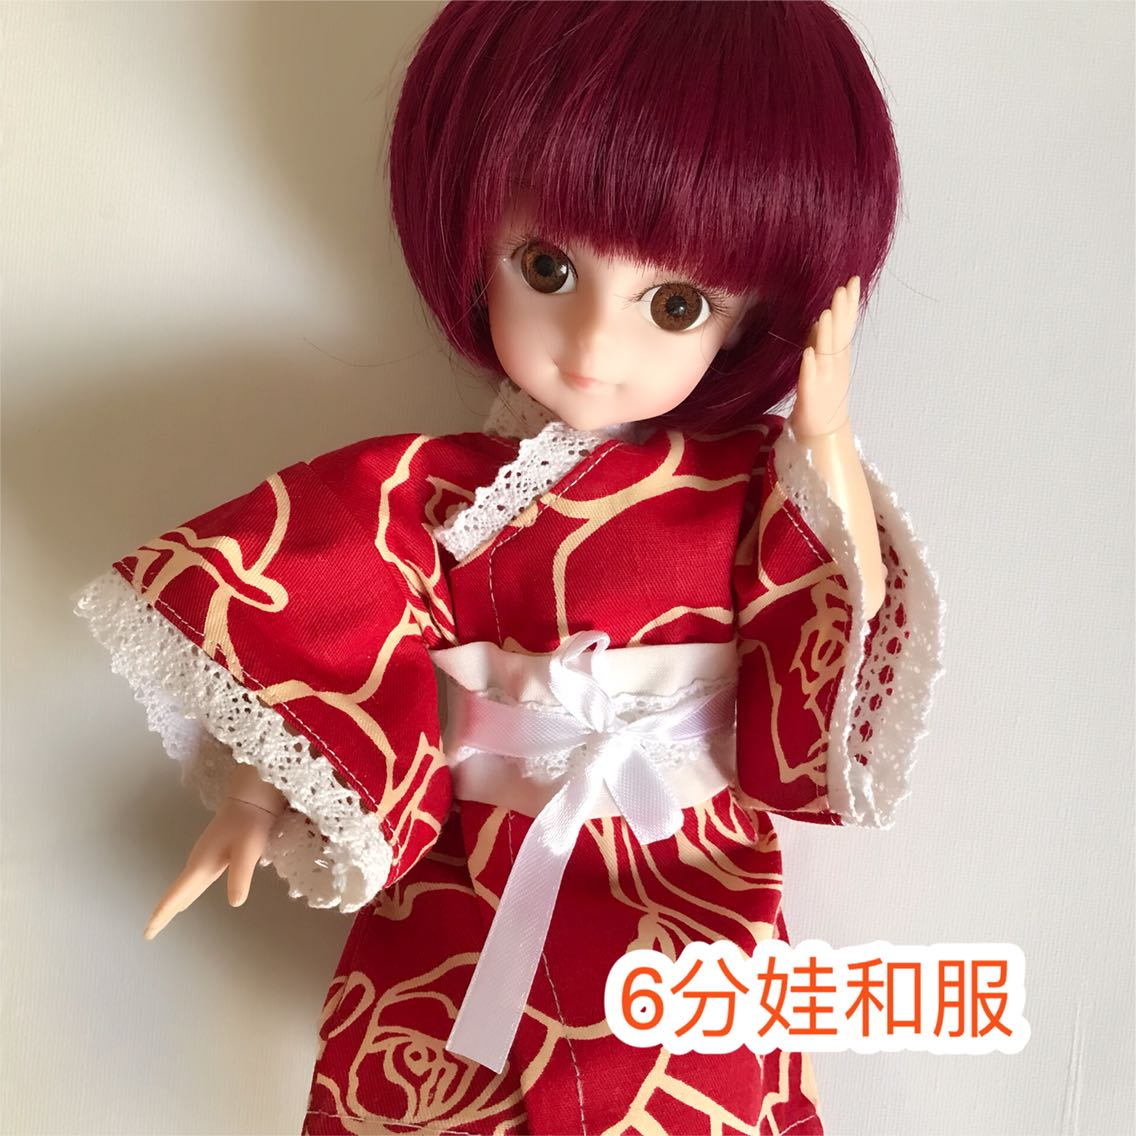 BJD人形玉型関節4分6分女性の古風な着物の多色の人形の寝衣bjdの色